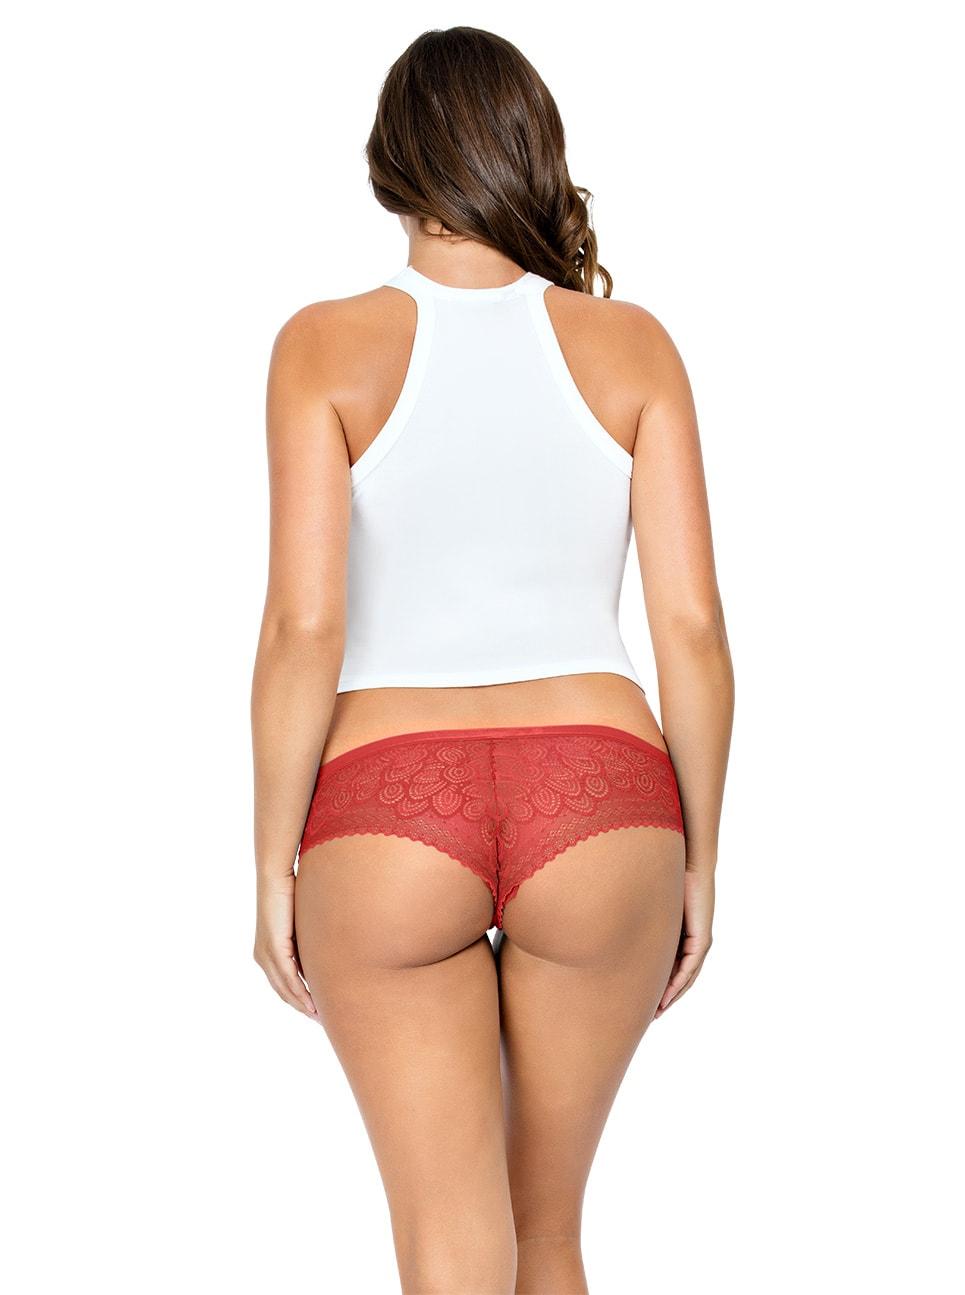 PARFAIT ParfaitPanty SoGlam HipsterPP502 Scarlette Back copy - Parfait Panty So Glam Hipster - Scarlette - PP502